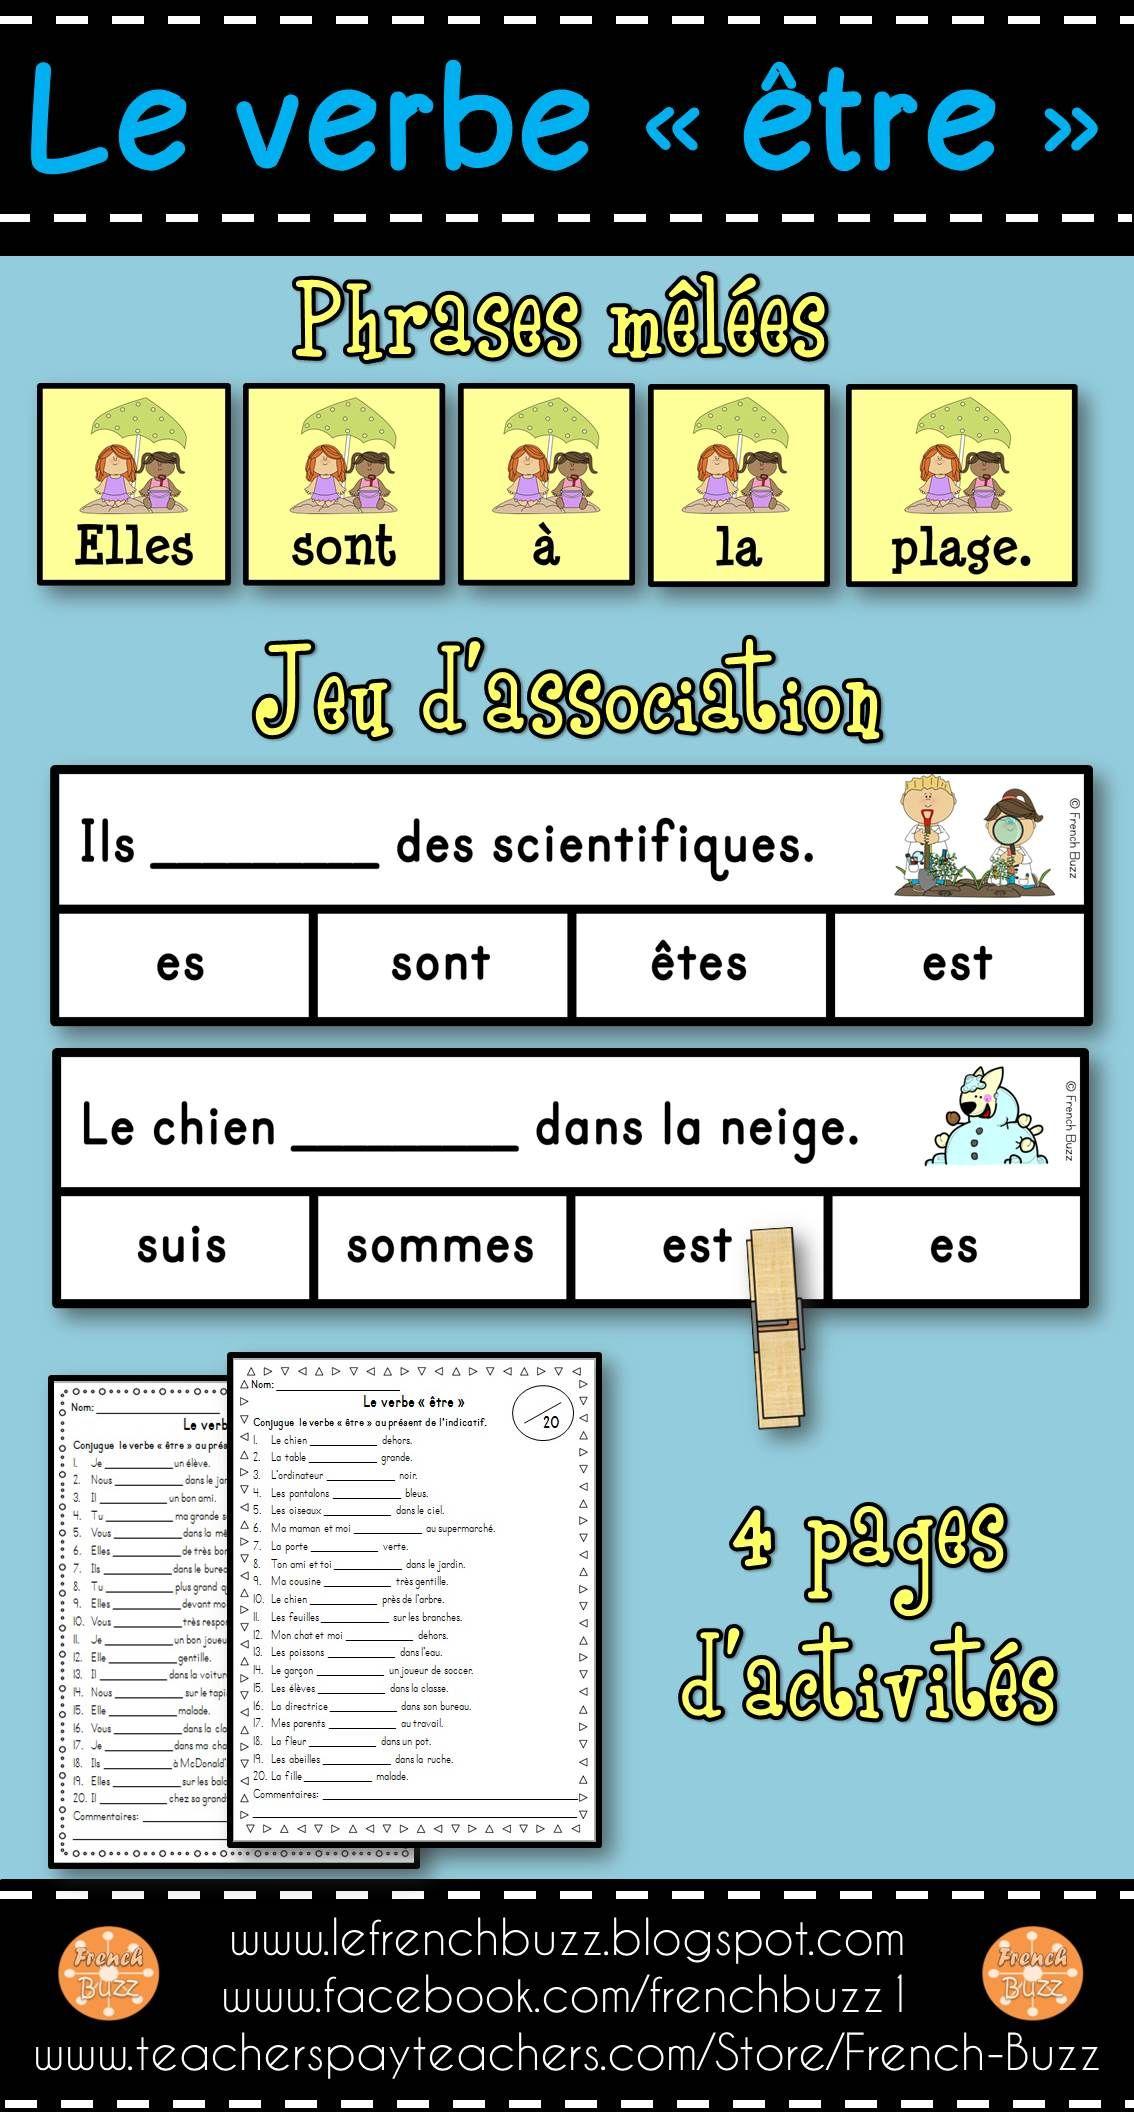 Le Verbe Etre Ensemble 3 Activites Teaching French Language Class English Book